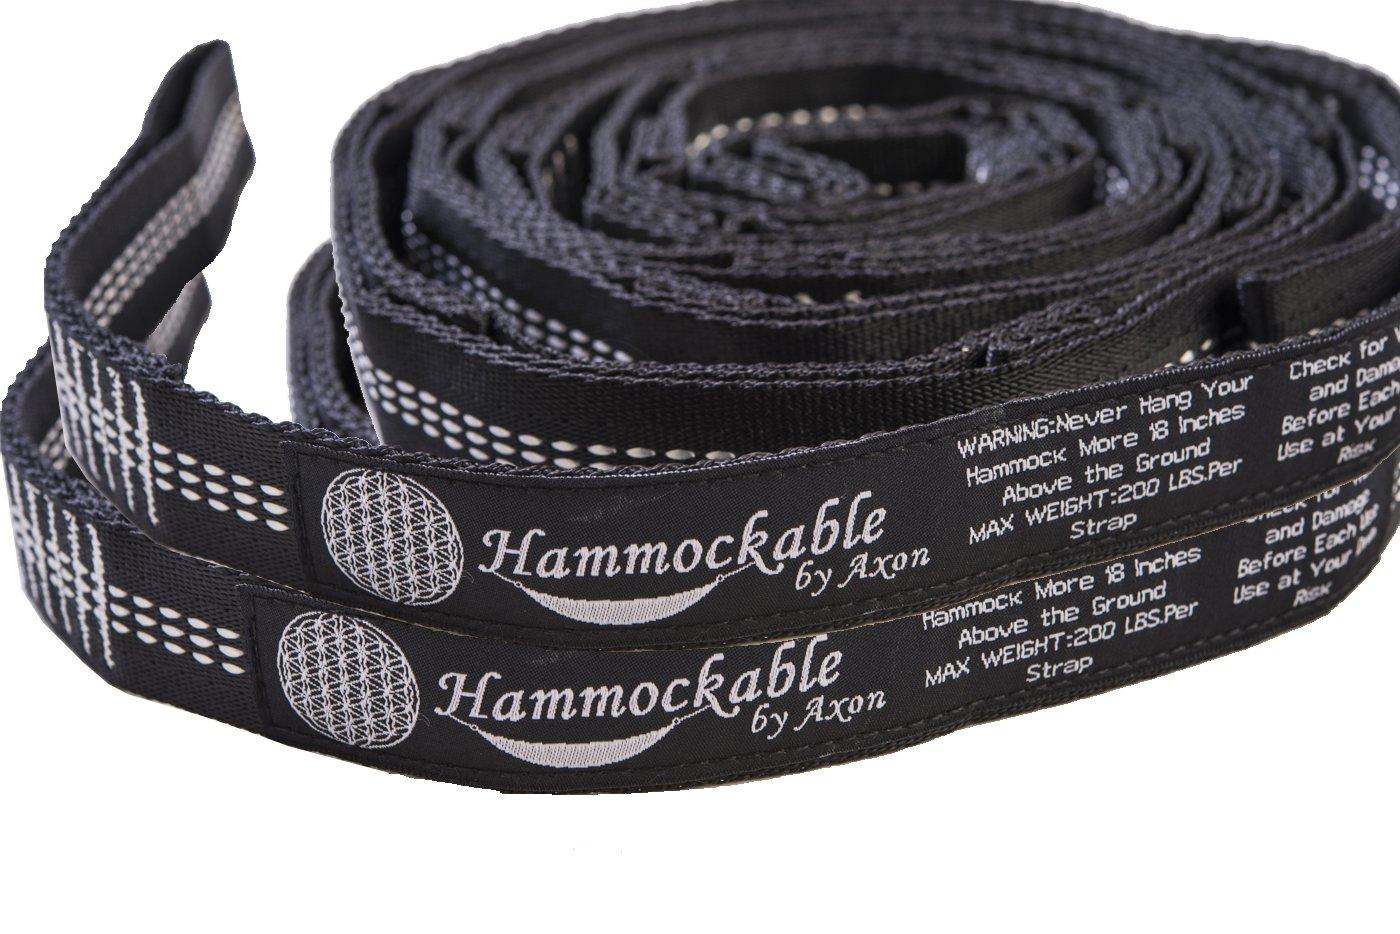 2 Loops /… Hammockable XL #1 Hammock Suspension System Combined 26 Ft Long Tree Strap Set w// 44